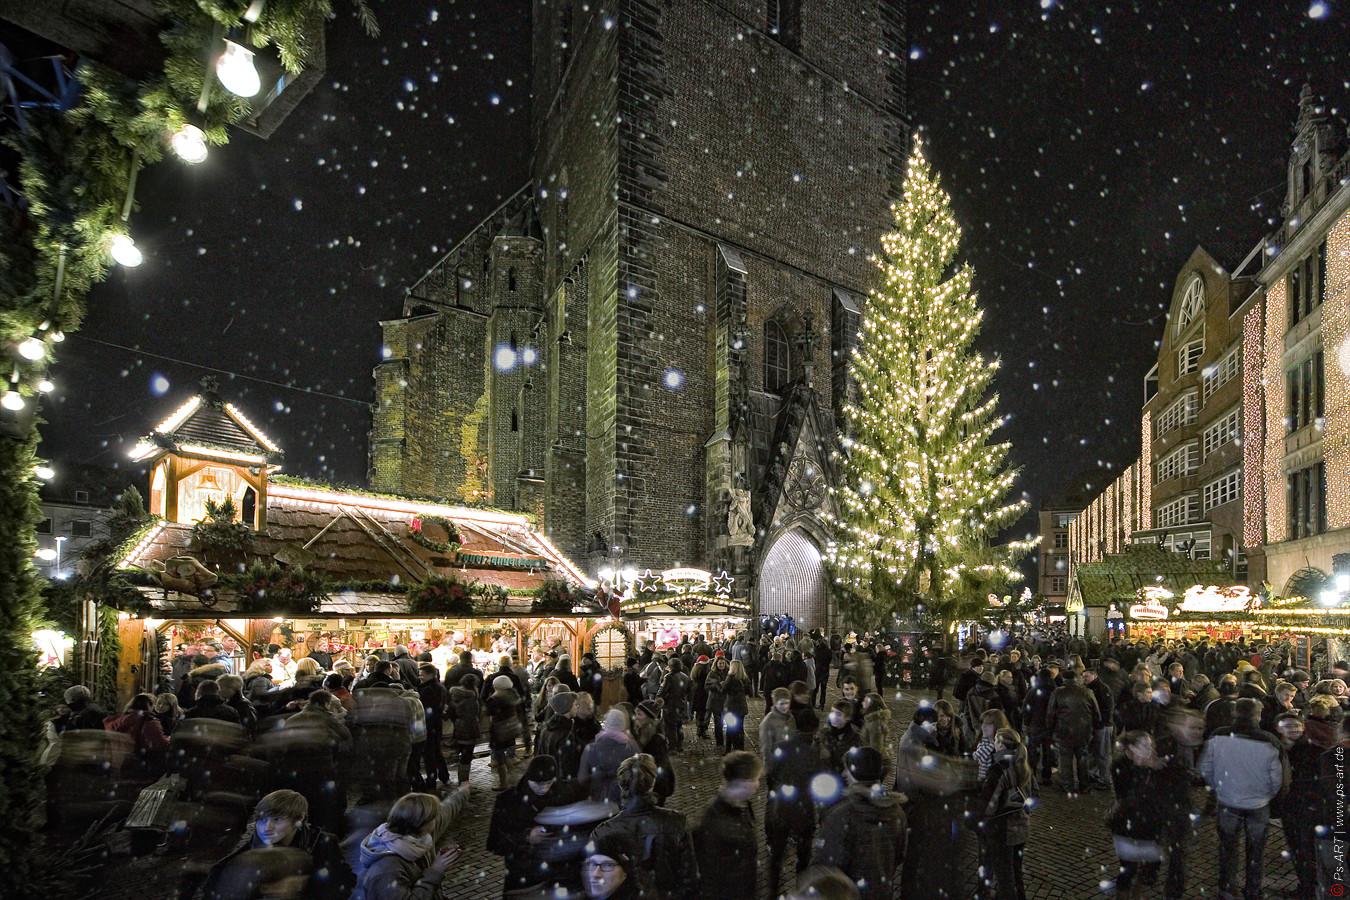 Hannover Weihnachtsmarkt.Weihnachtsmarkt Hannover 2012 Ps Art Fotograf Hannover